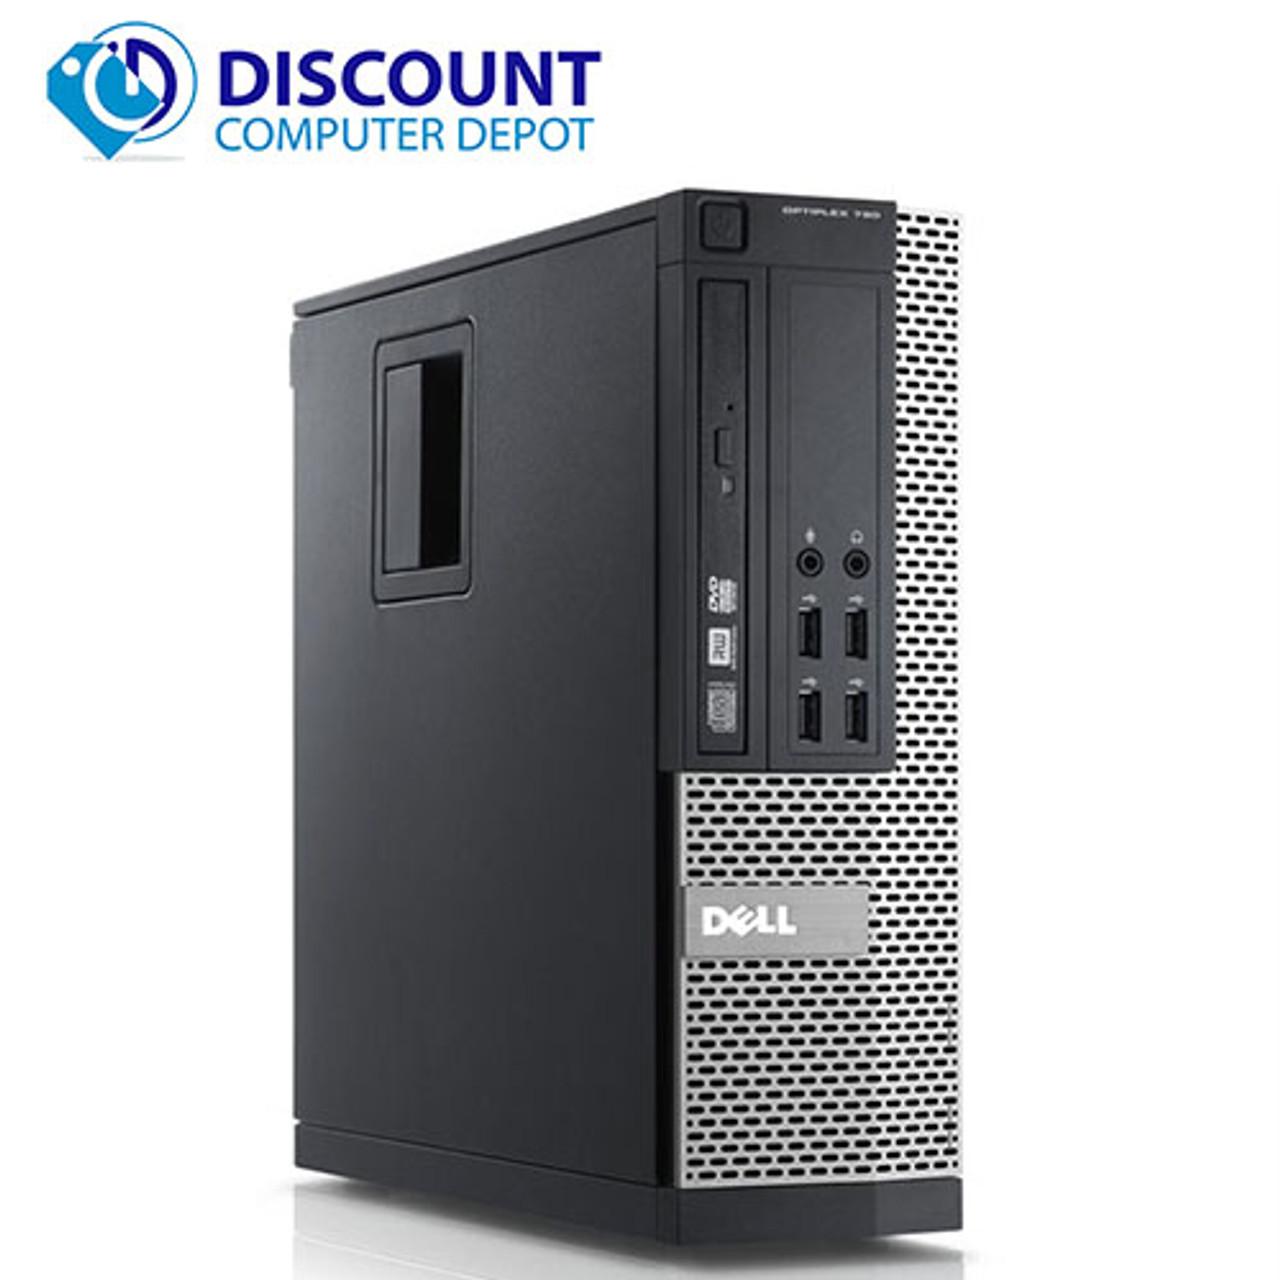 Dell Optiplex 790/990 Business Computer PC Windows 10 Pro 3 10Ghz 8Gb 1TB  WiFi